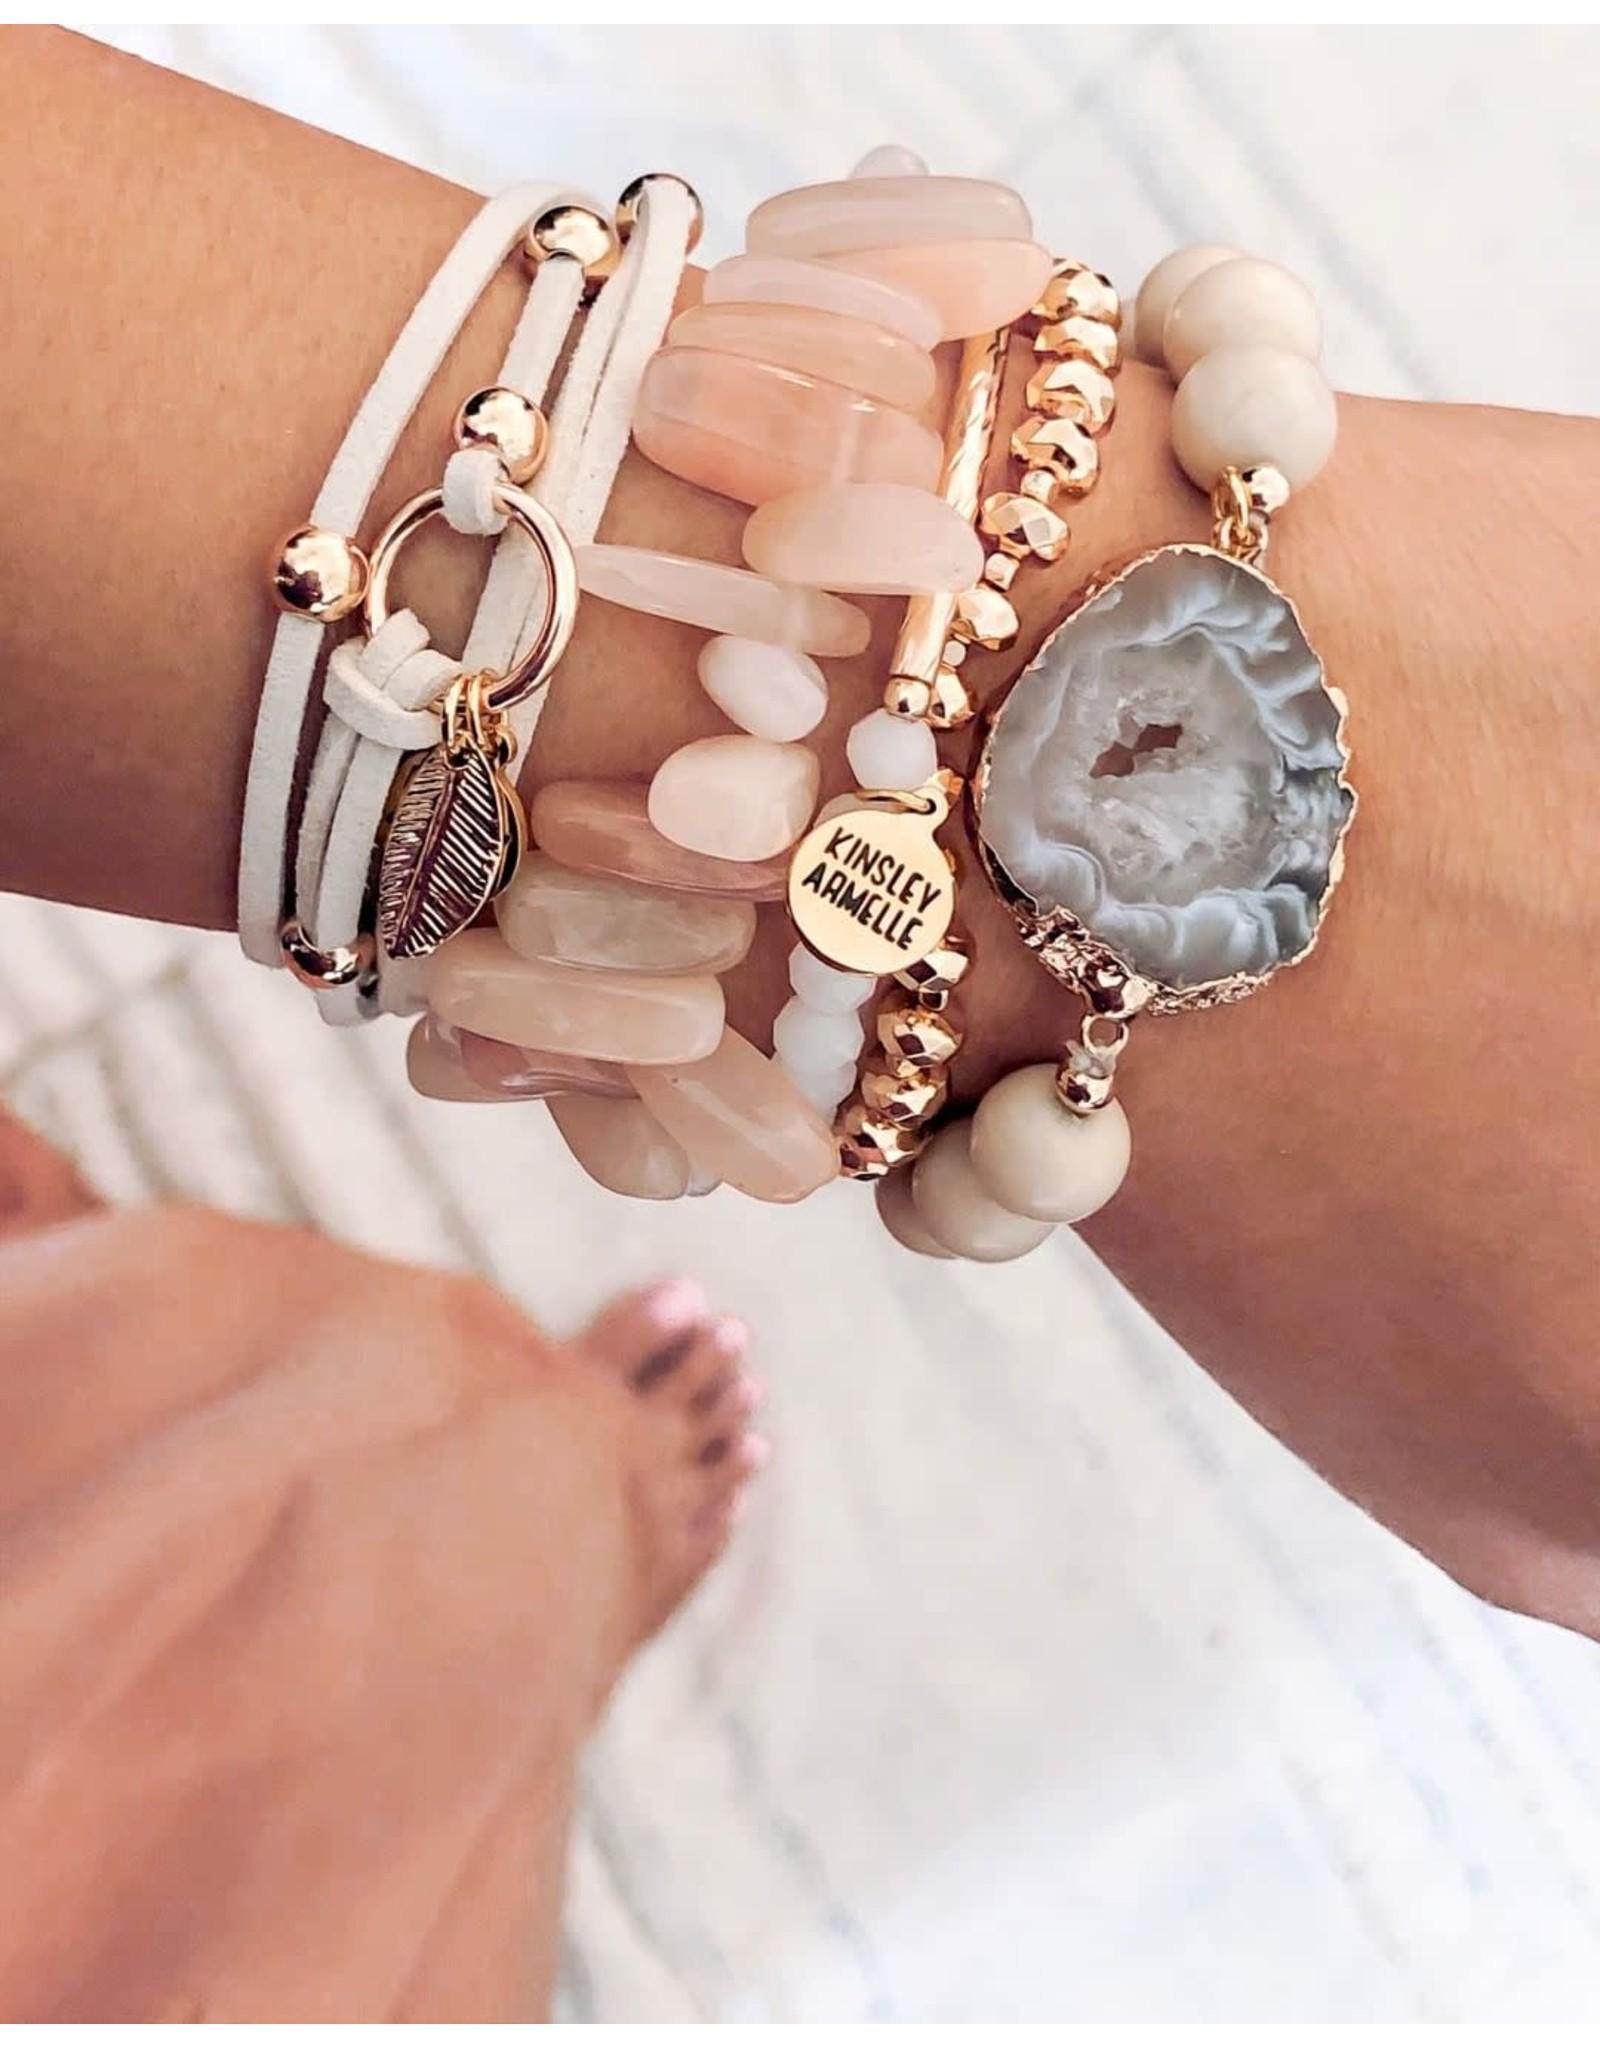 Kinsley Armelle Wrap Collection-Khaki Bracelet